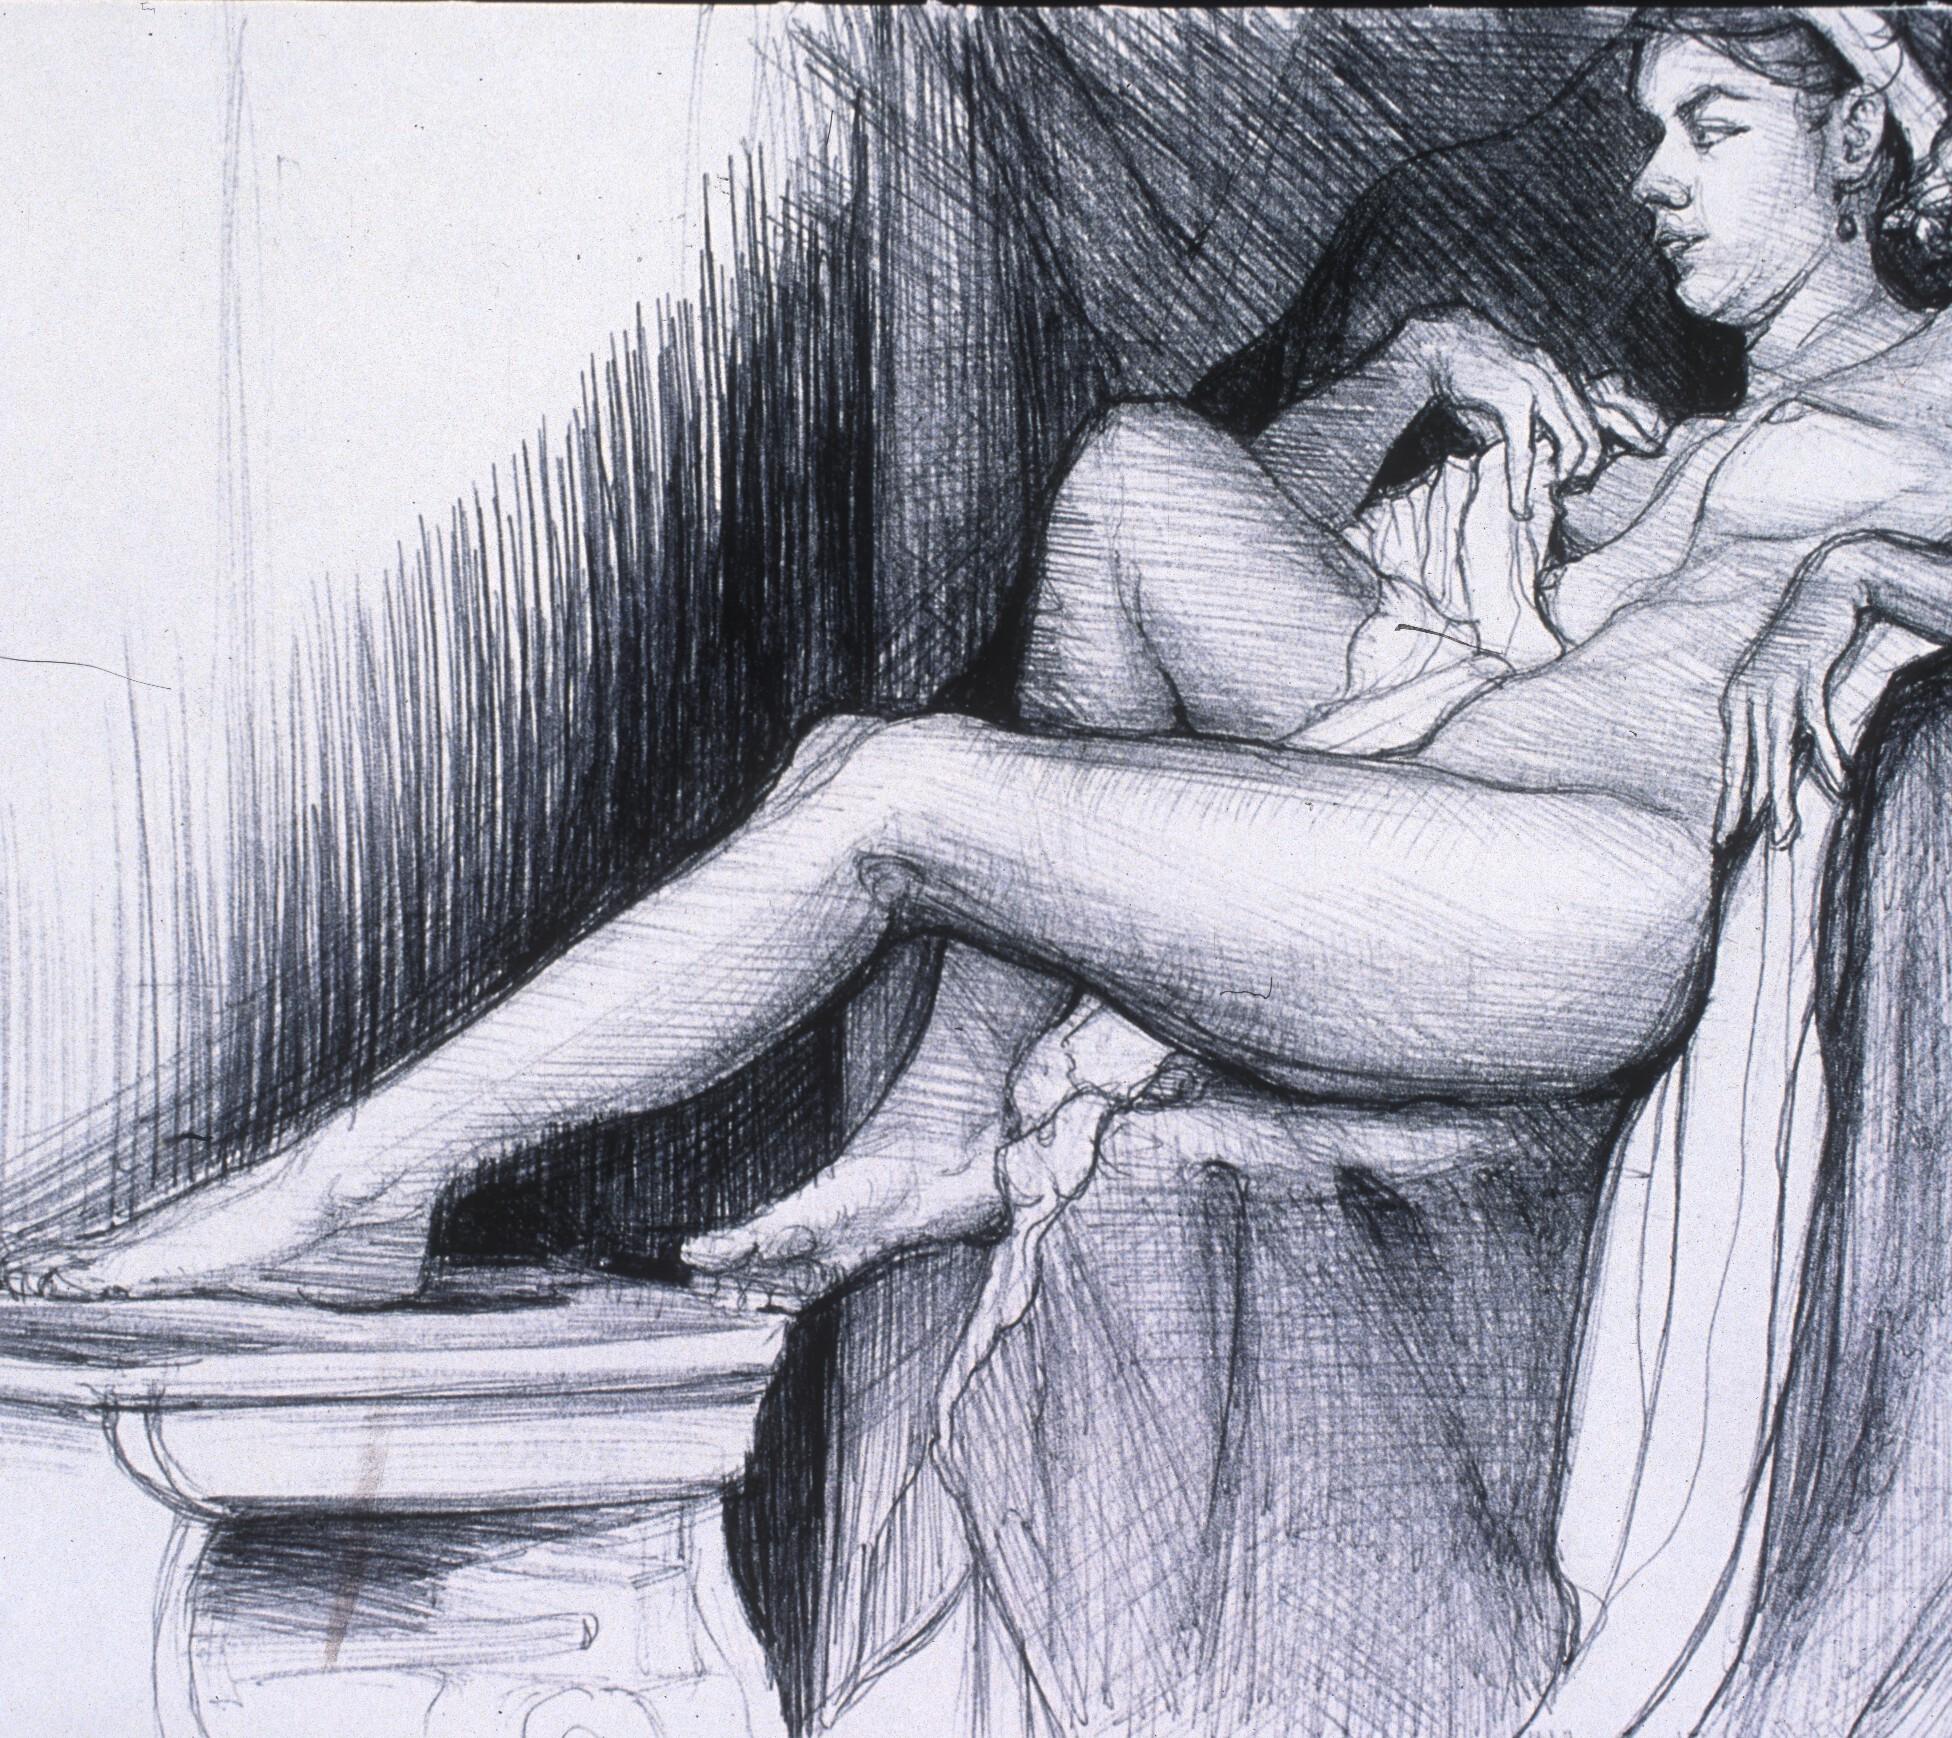 "Lou Ann Burkhardt  Robin Reclining  , 2001 Pen and ink on paper 13-1/2"" x 16-1/2"", framed $395"